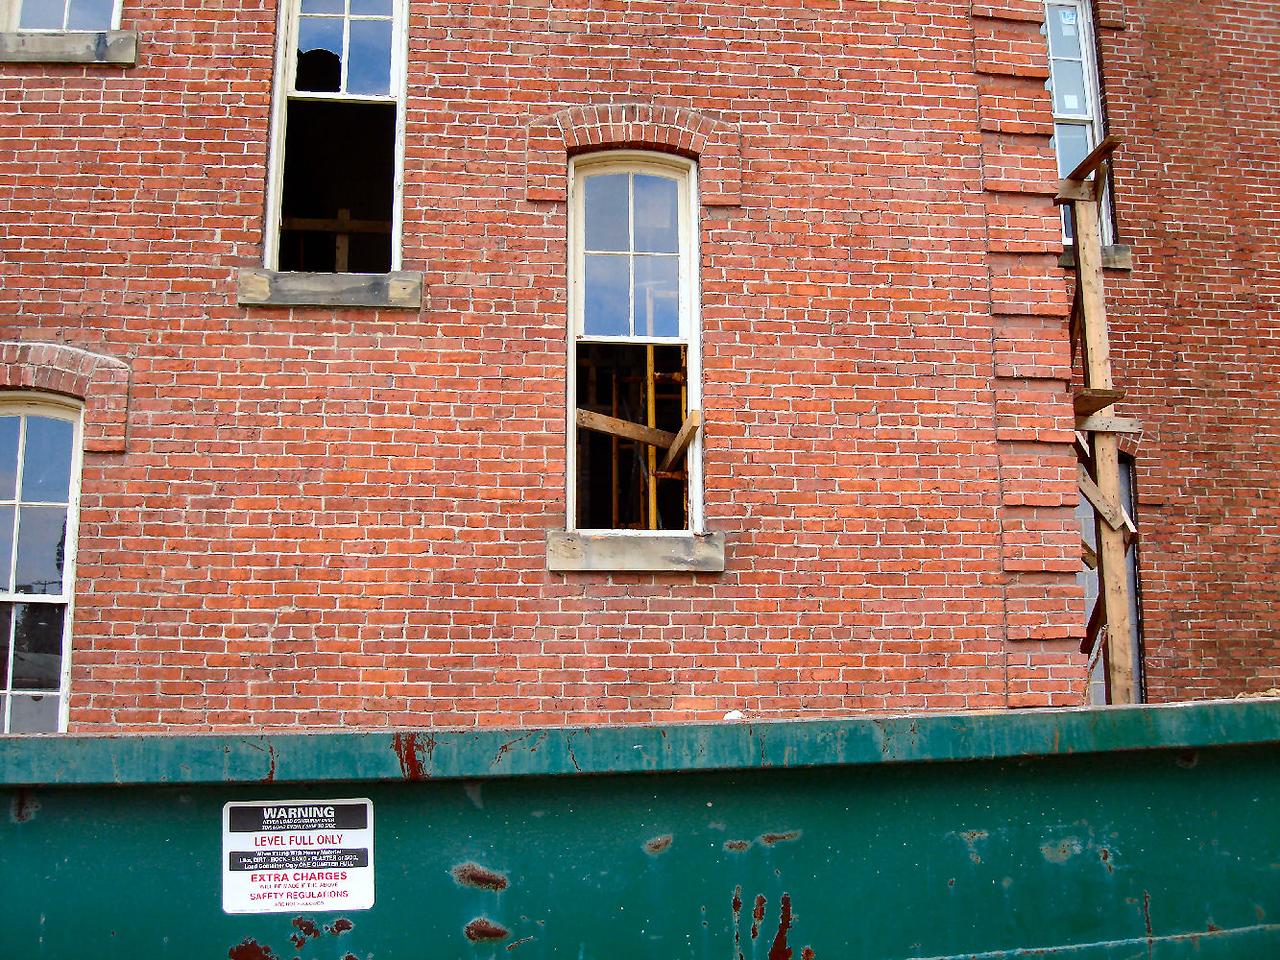 Saint Matthews Renovations 10-22-06 (1)